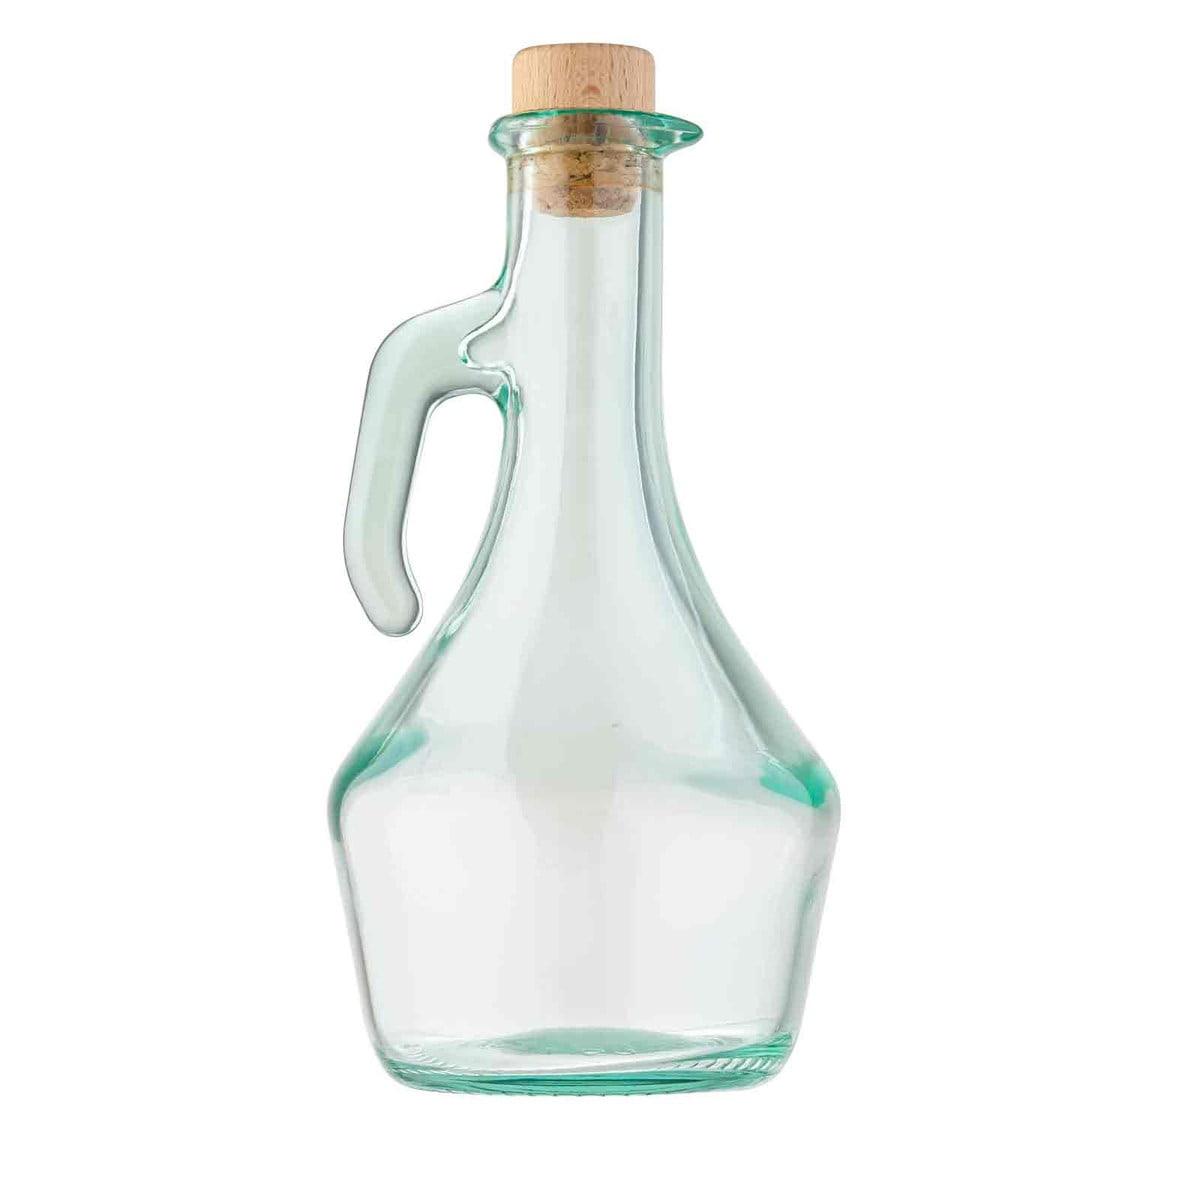 Tablecraft H9222 17 oz Portabella Green Glass Olive Oil Bottle w/ Cork Stopper